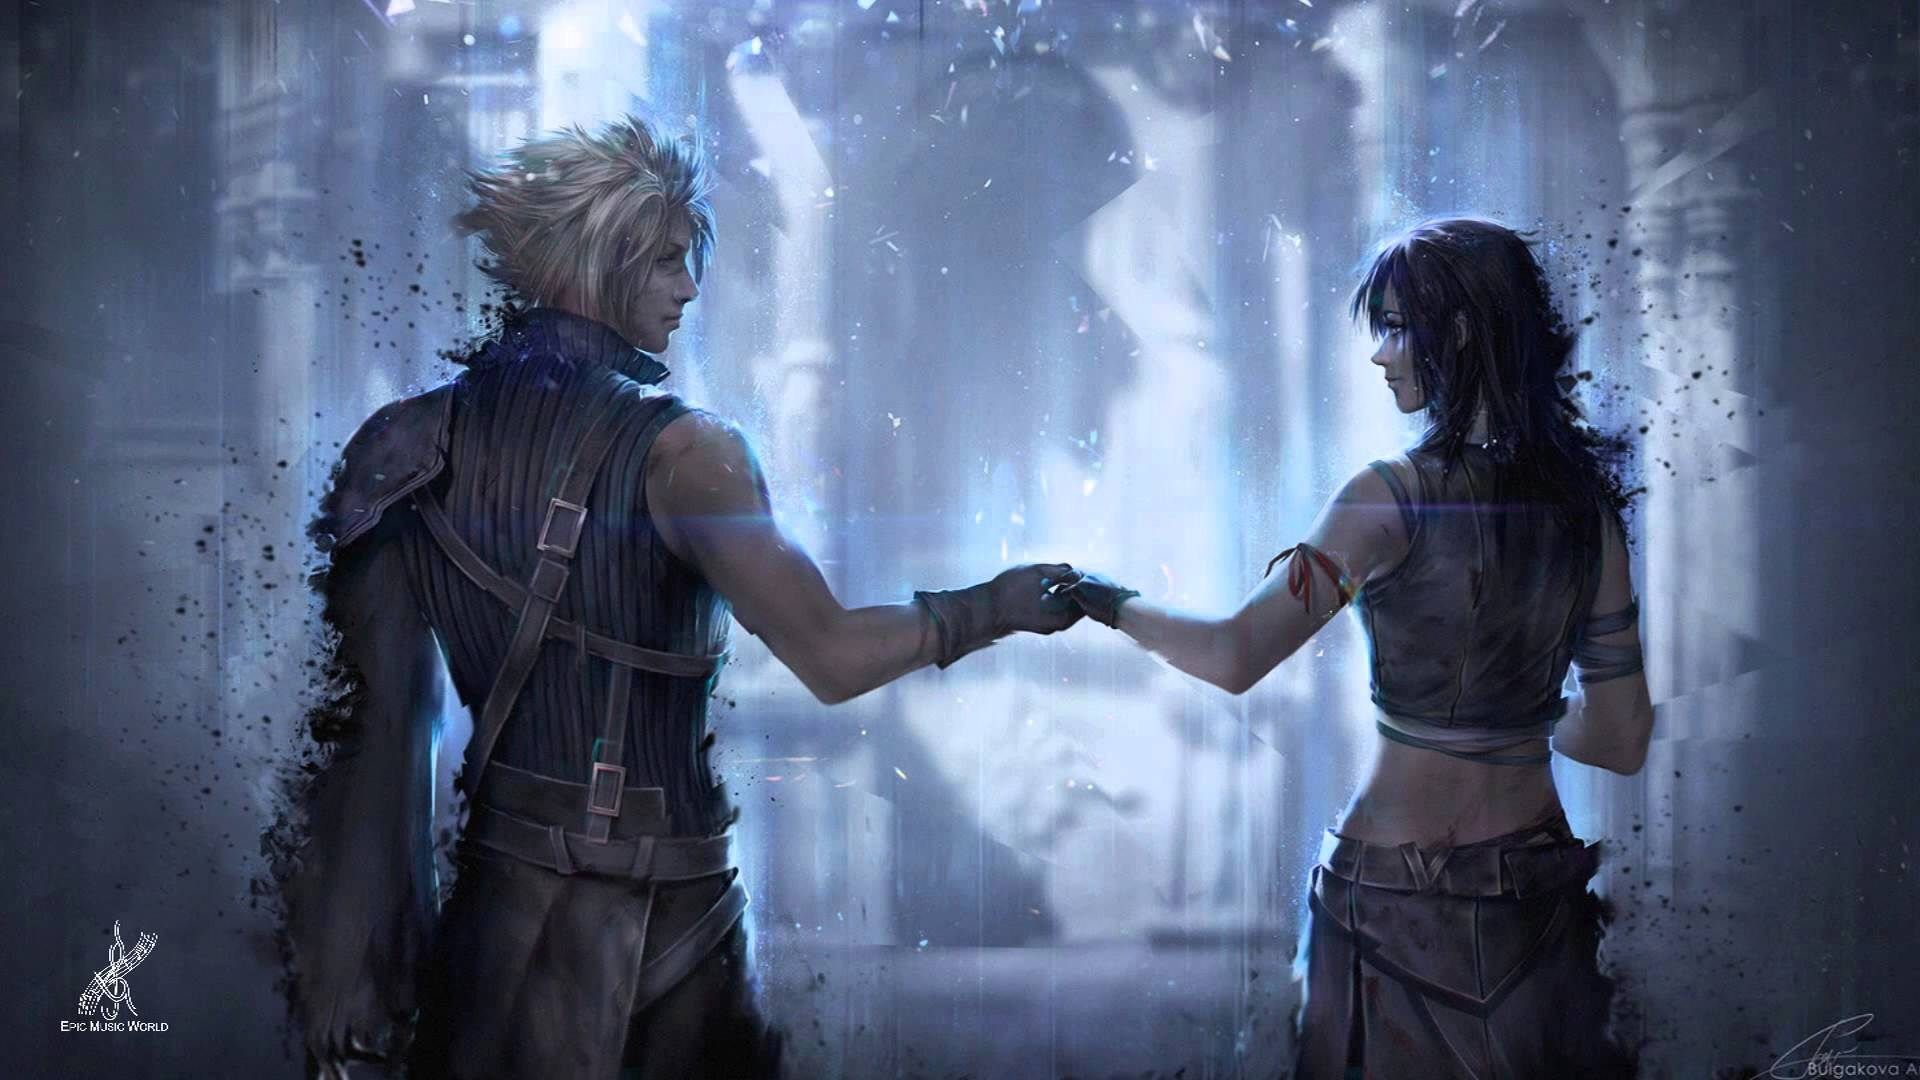 Final Fantasy 7 Remake Wallpaper 4k - HD Wallpaper